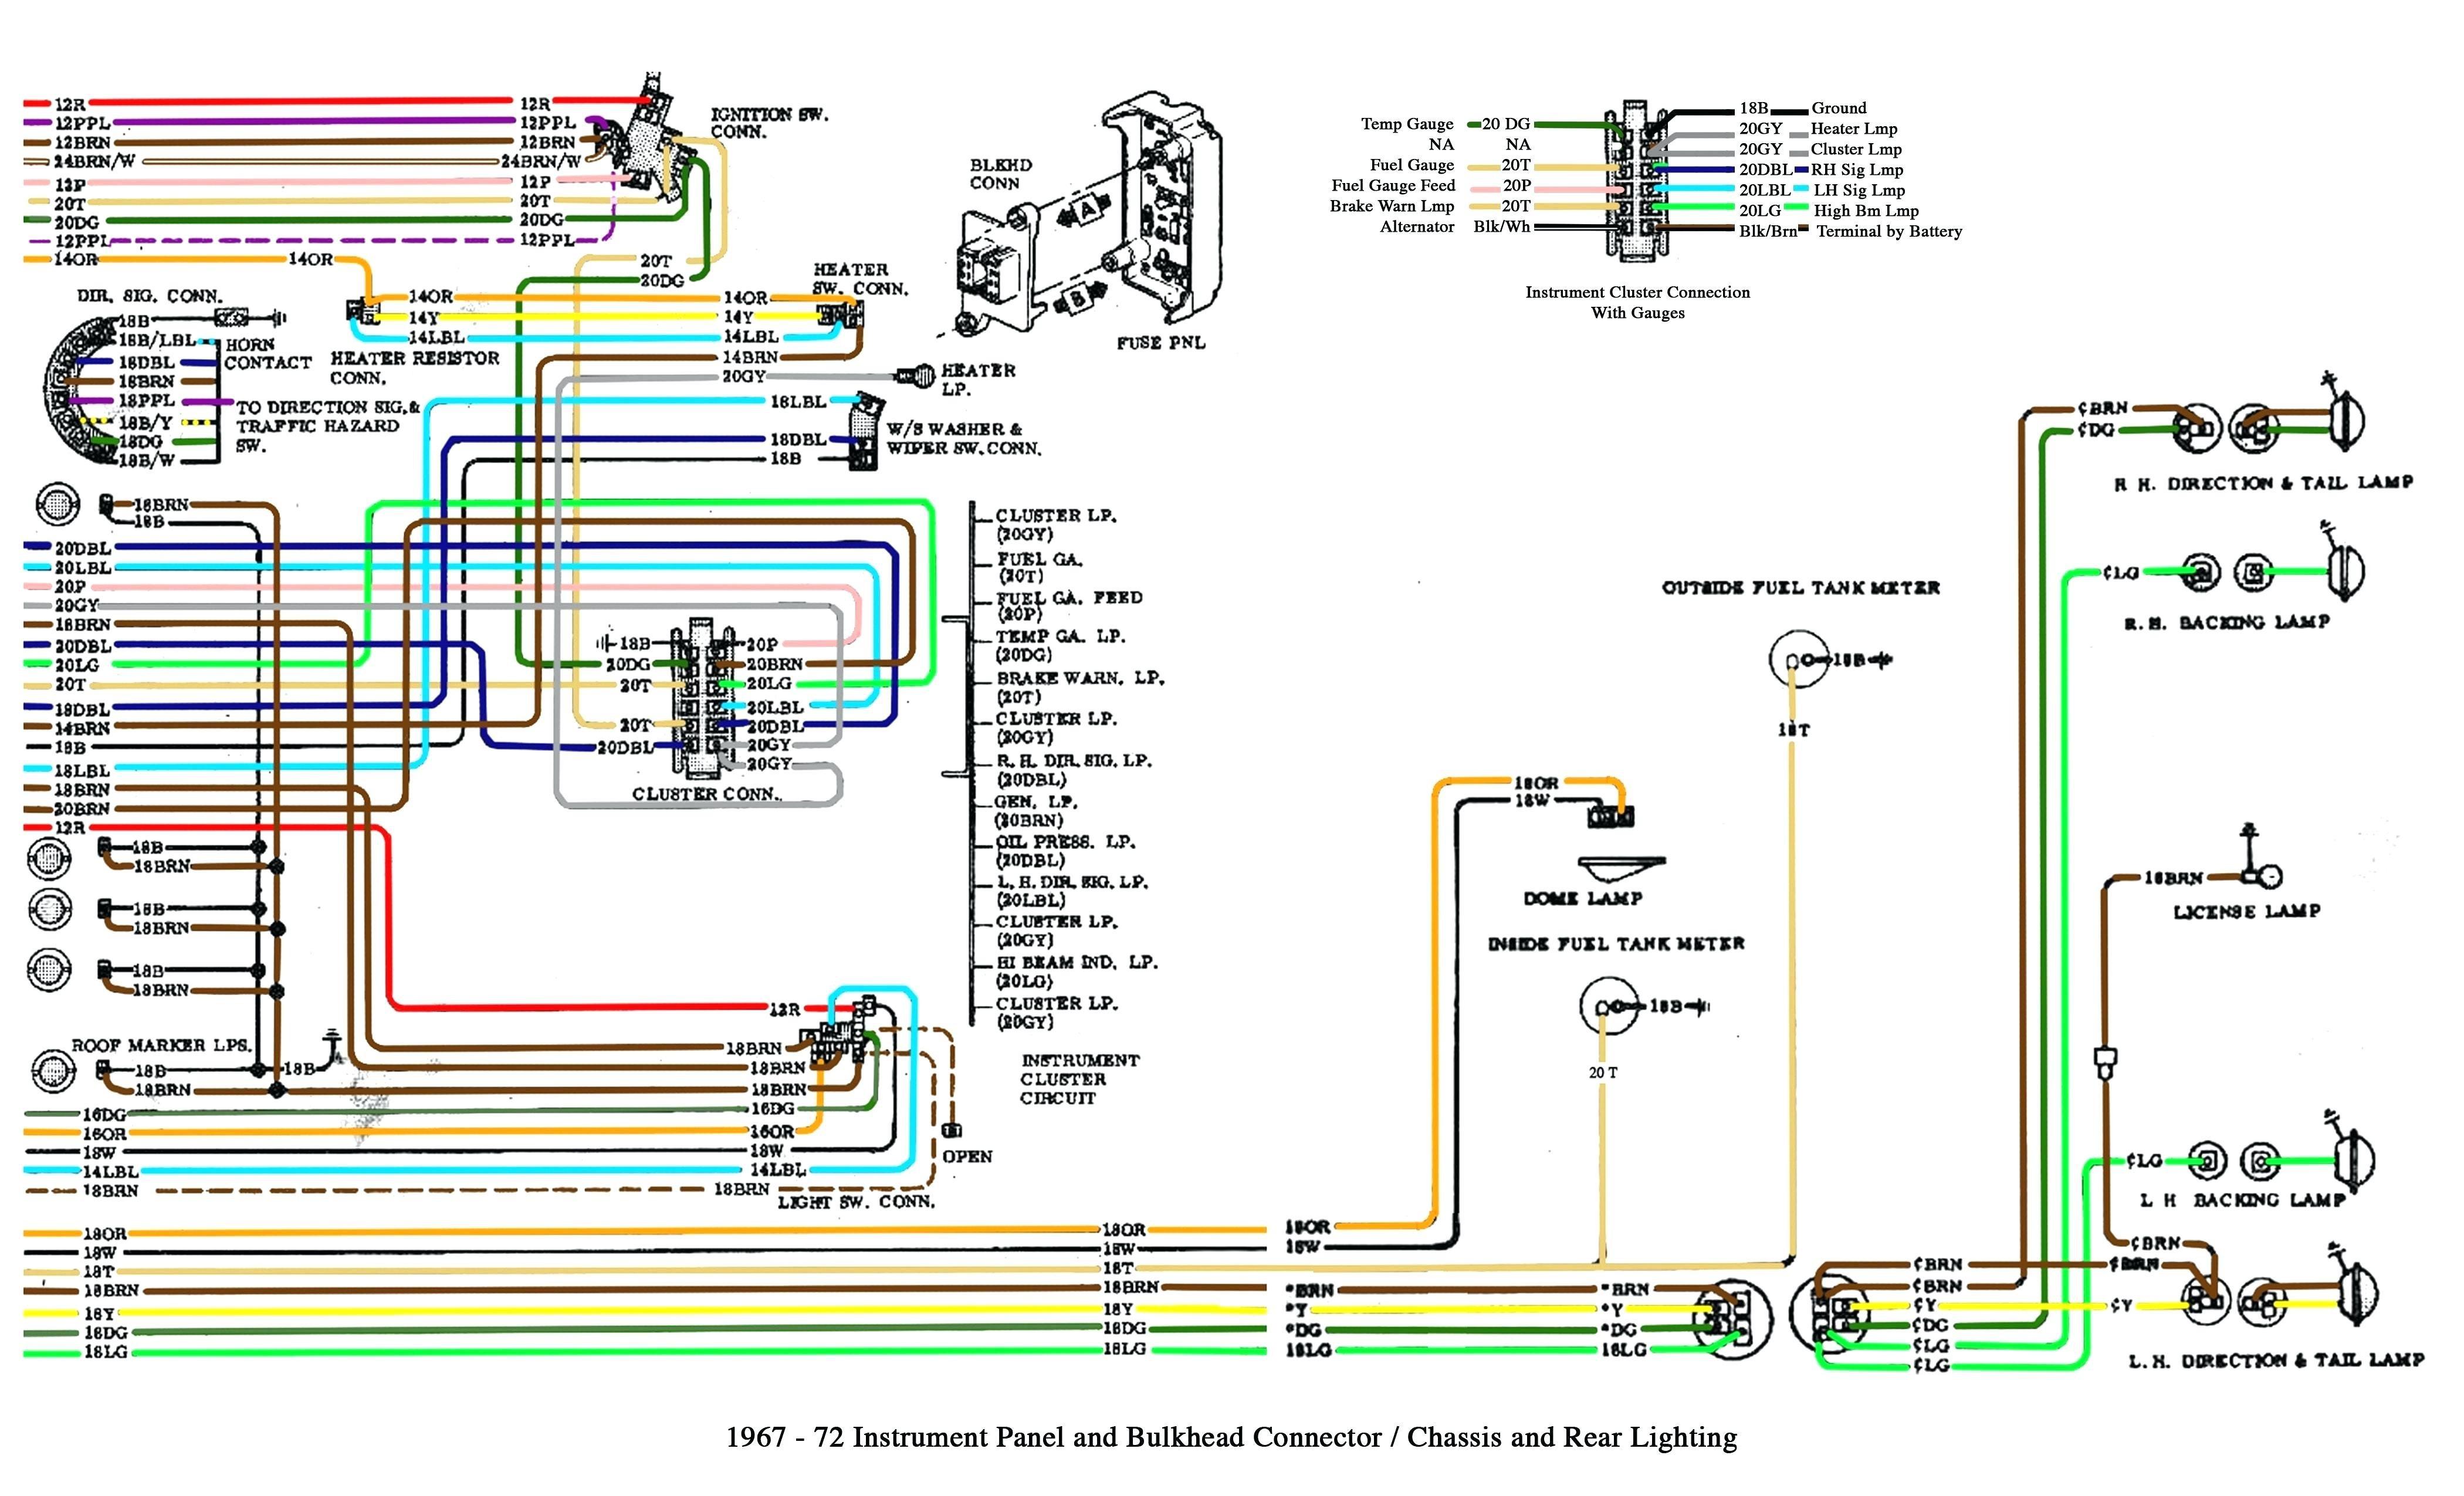 Tail Light Wiring Diagram Chevy Elegant Wiring Diagram Phenomenal Free 1993 Chevy Silverado Wiring Diagram